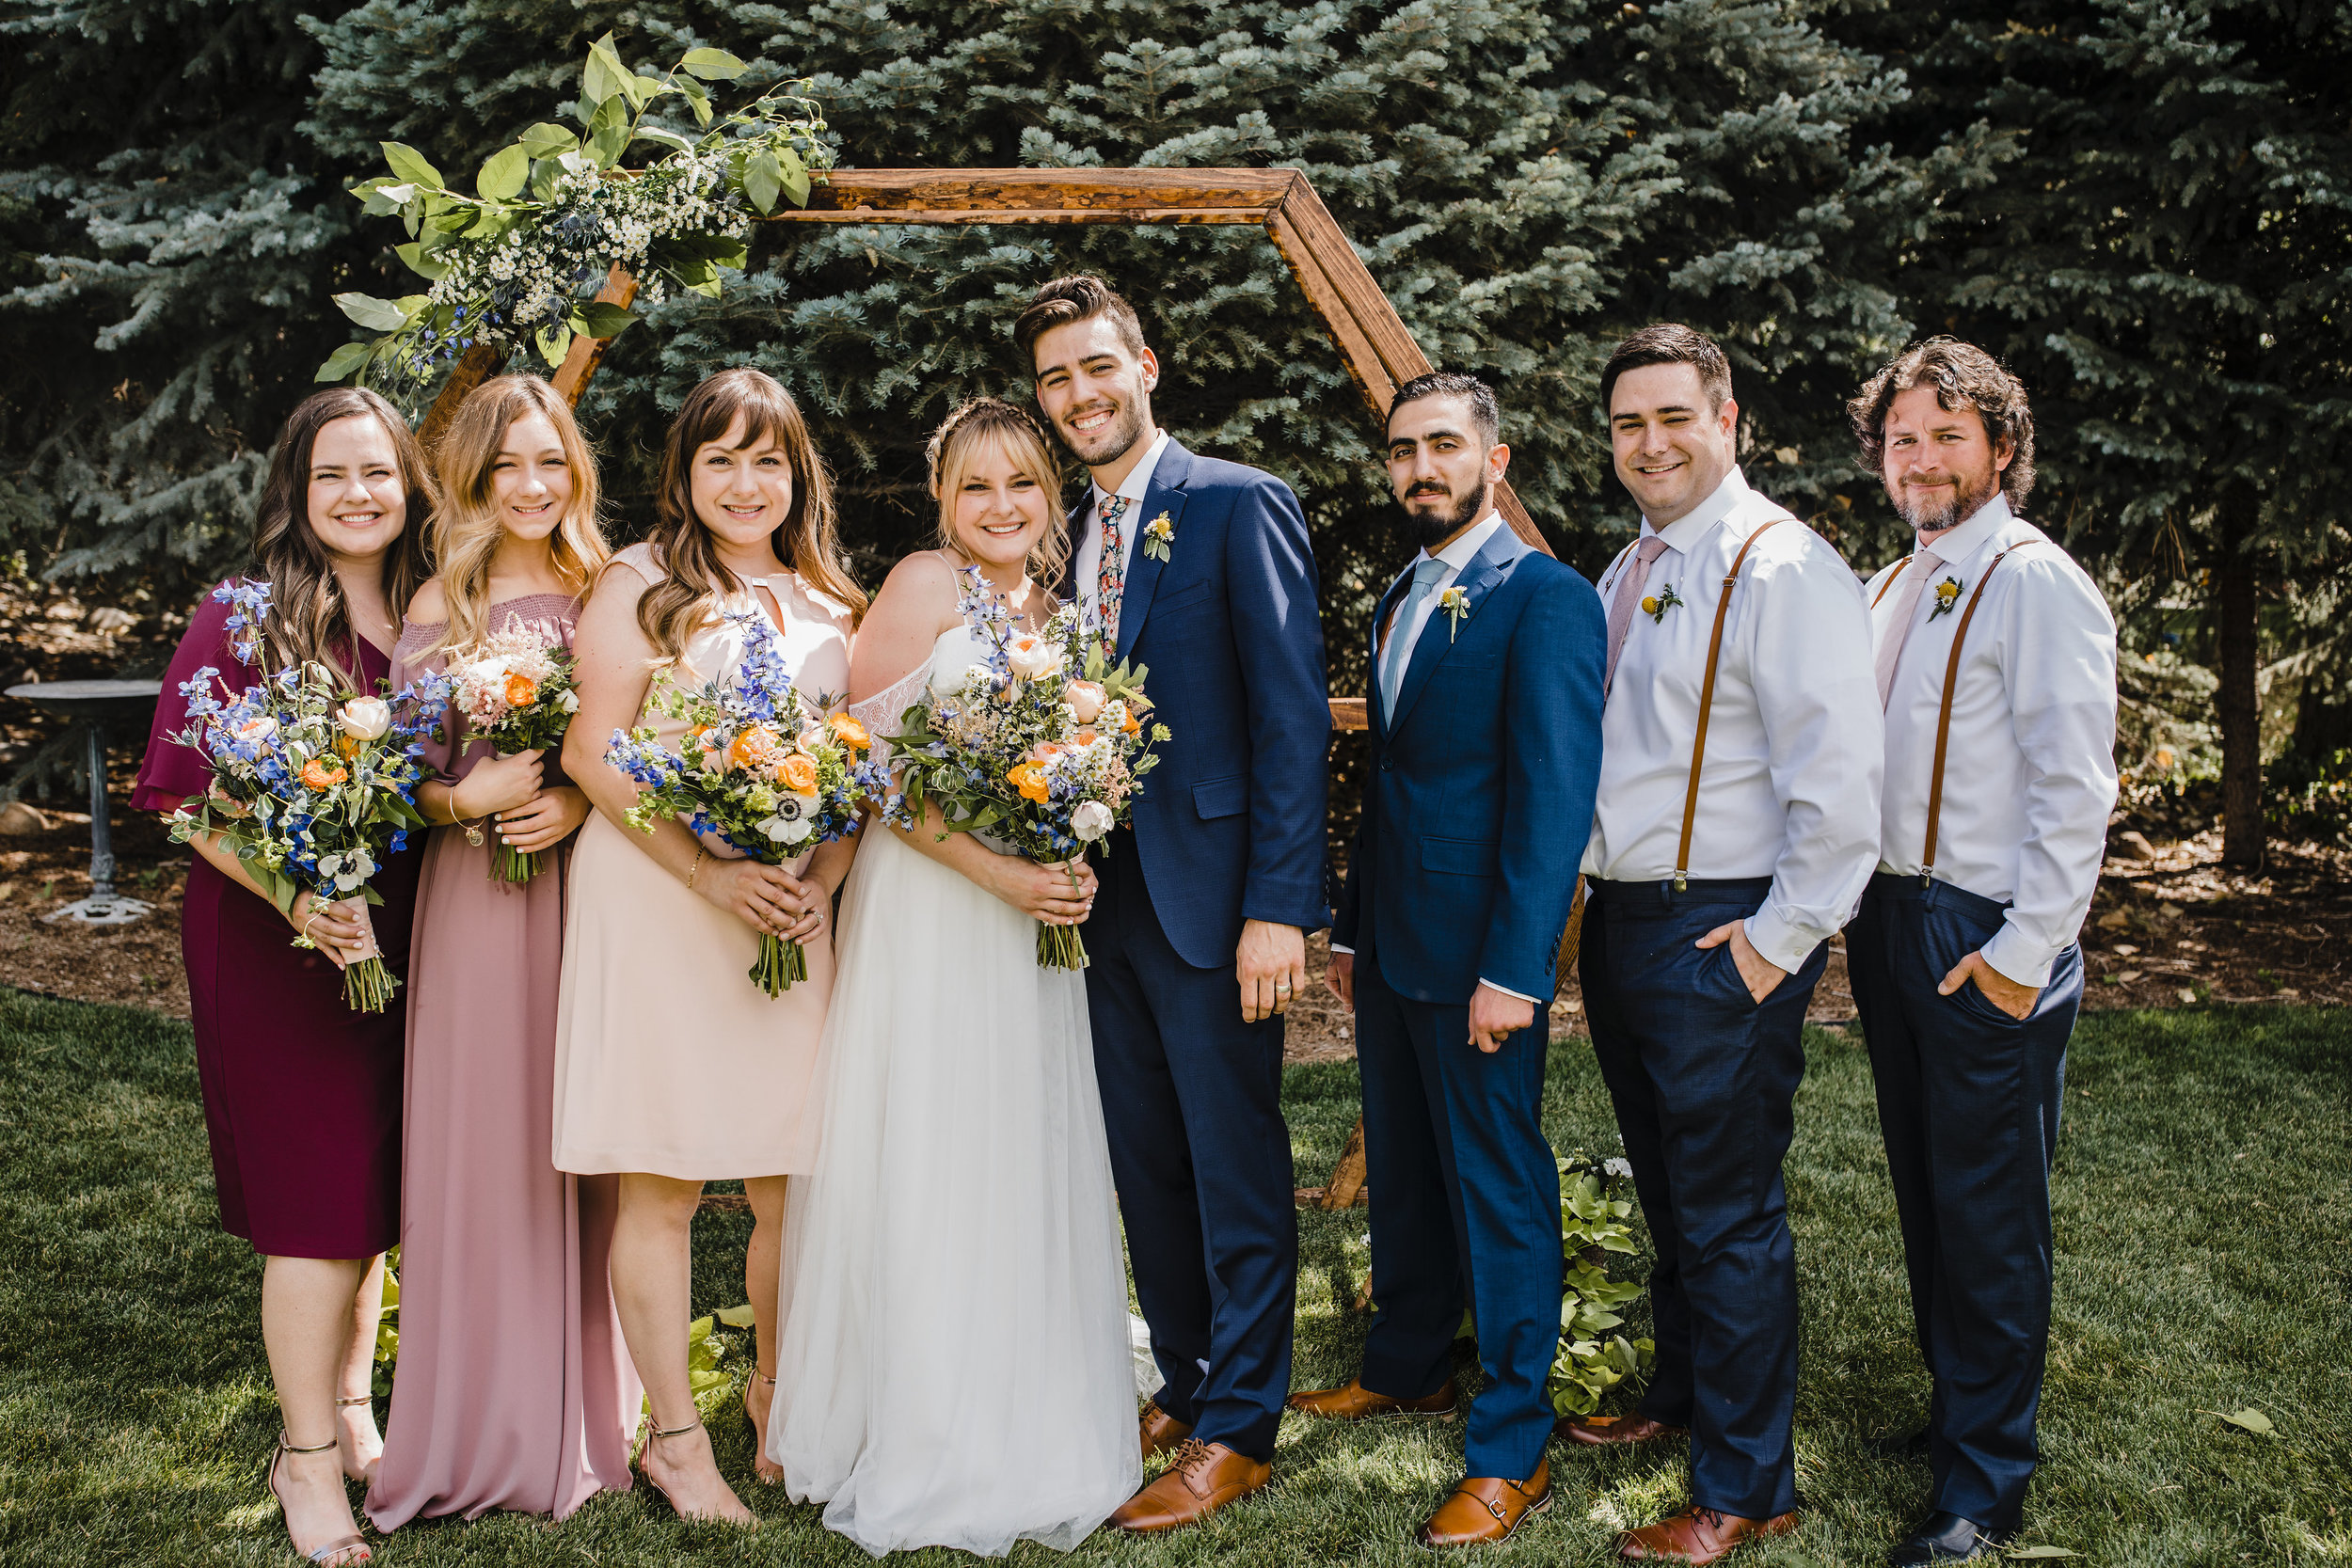 professional wedding photographer in salt lake city utah bohemian outdoor wedding wedding party groomsmen bridesmaids pink red wildflower bouquet